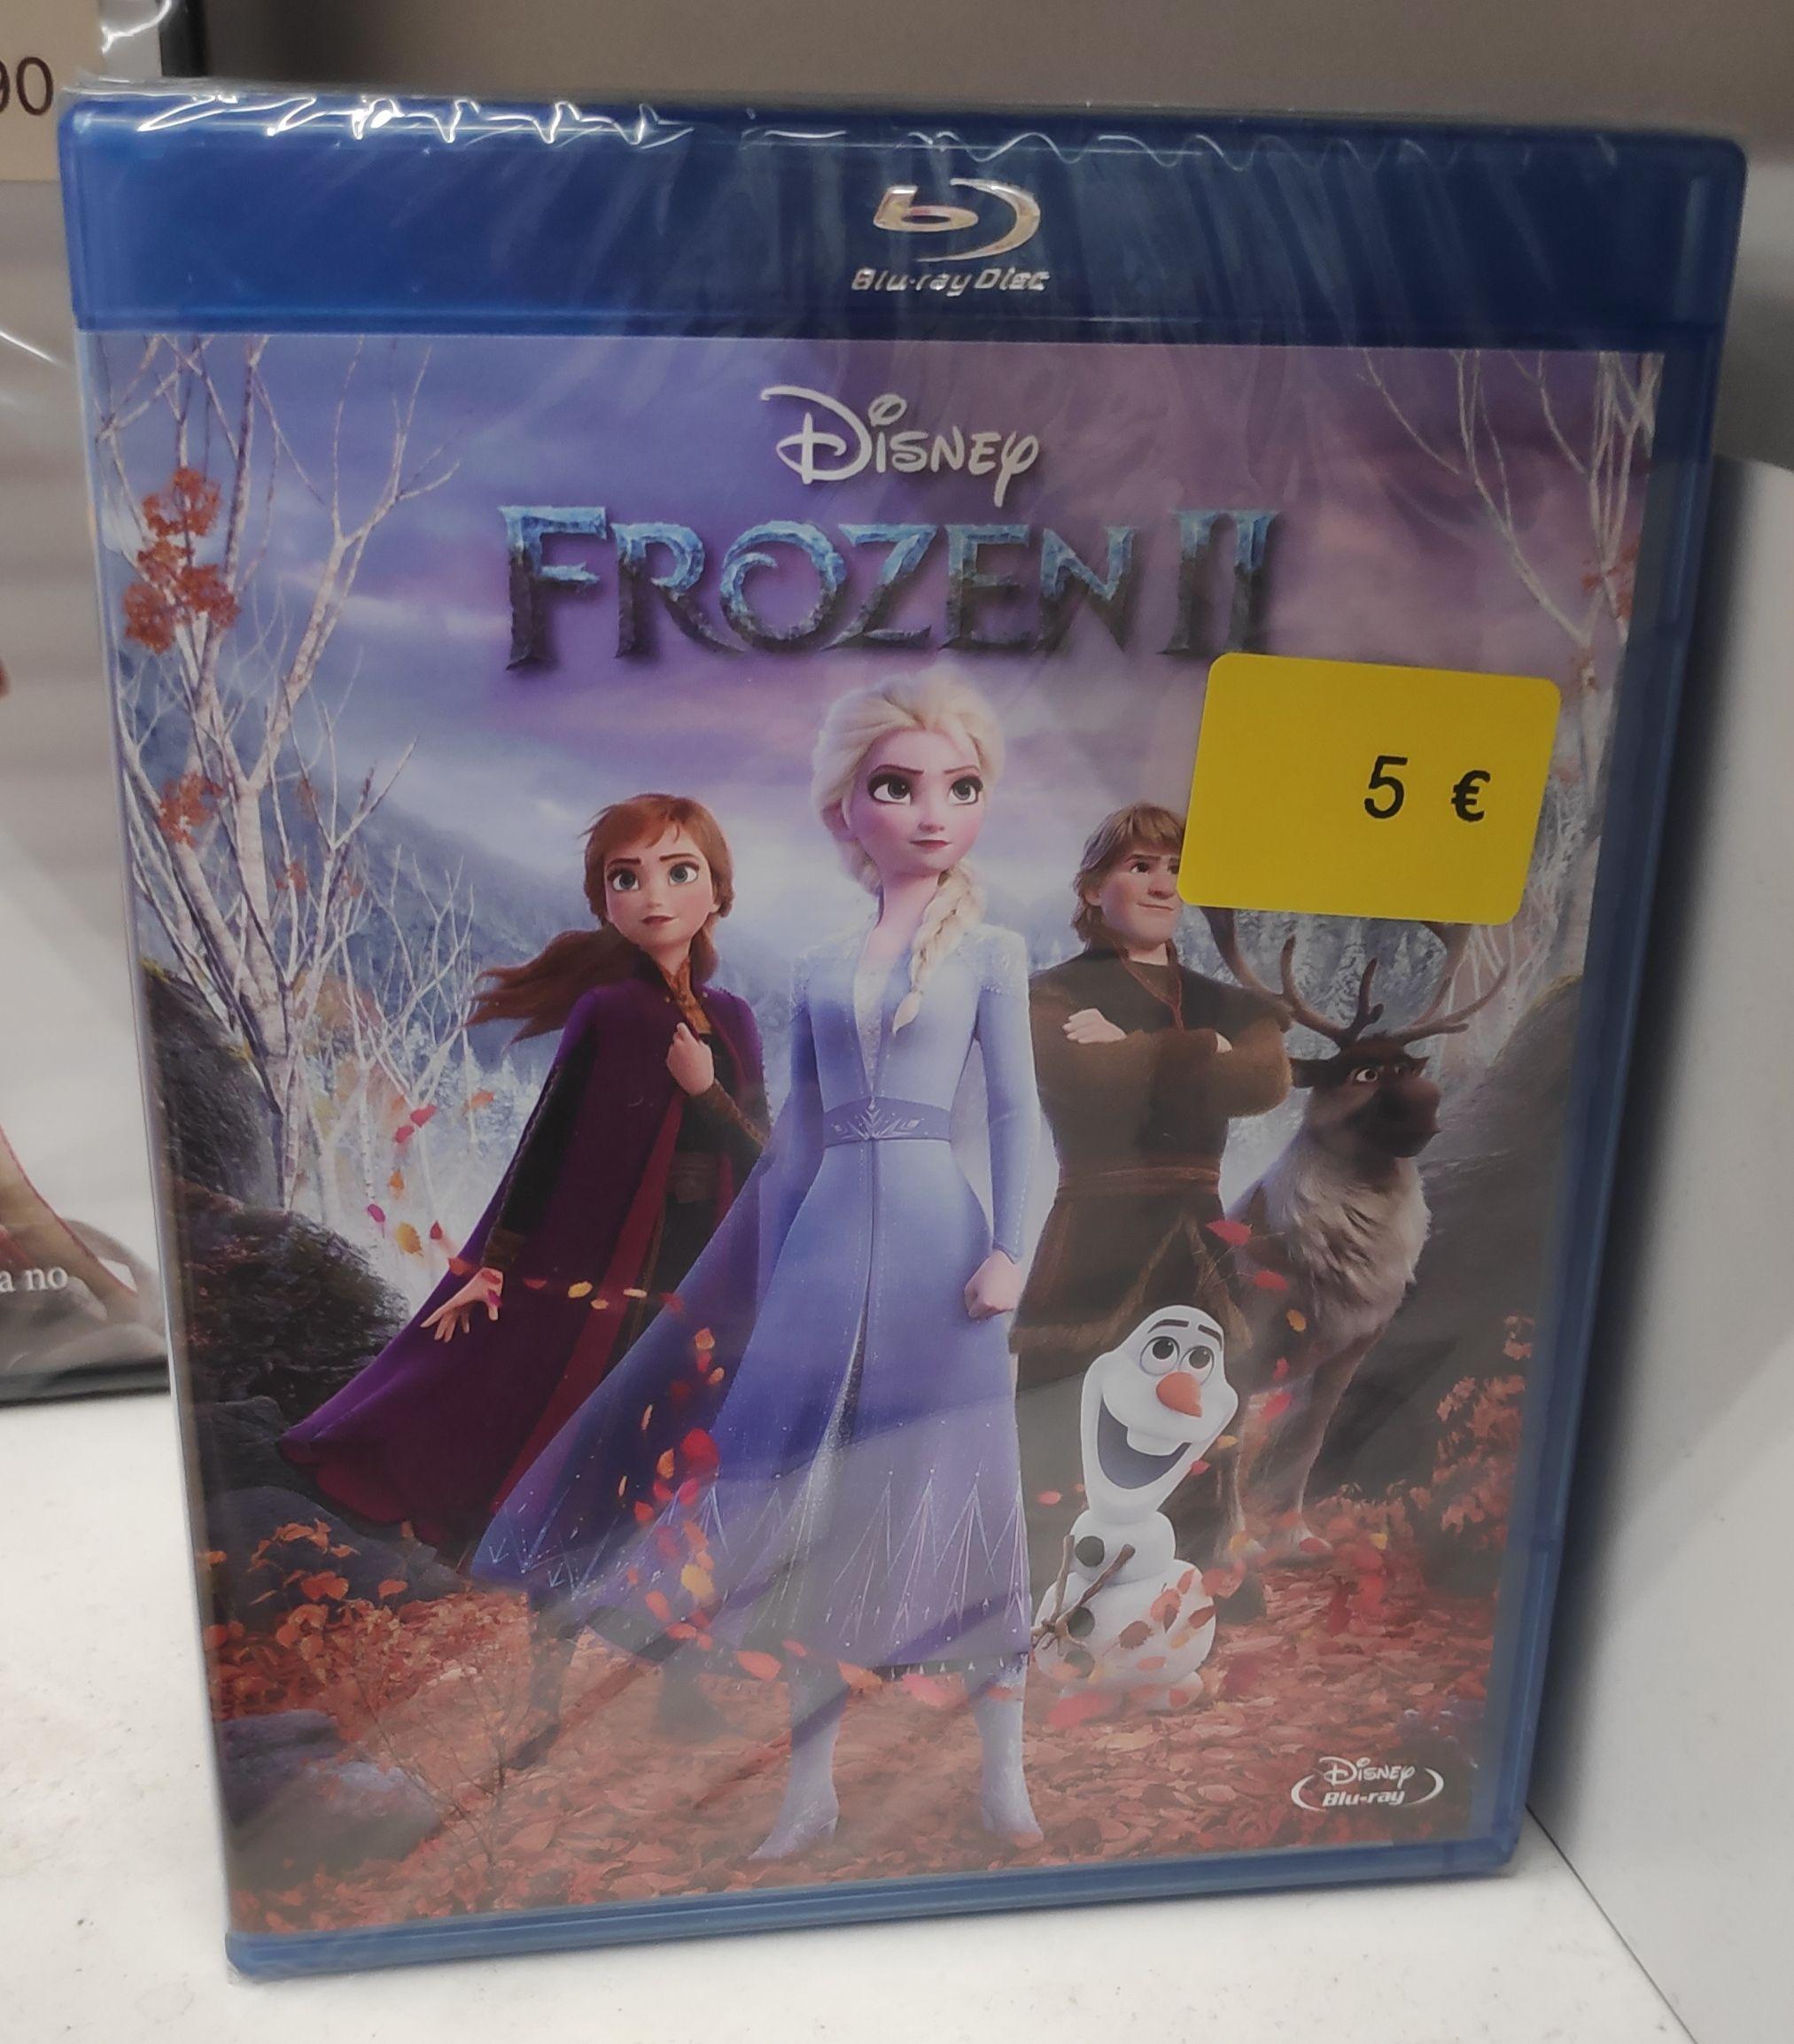 Frozen 2 Blu-ray Carrefour de Plaza Norte 2